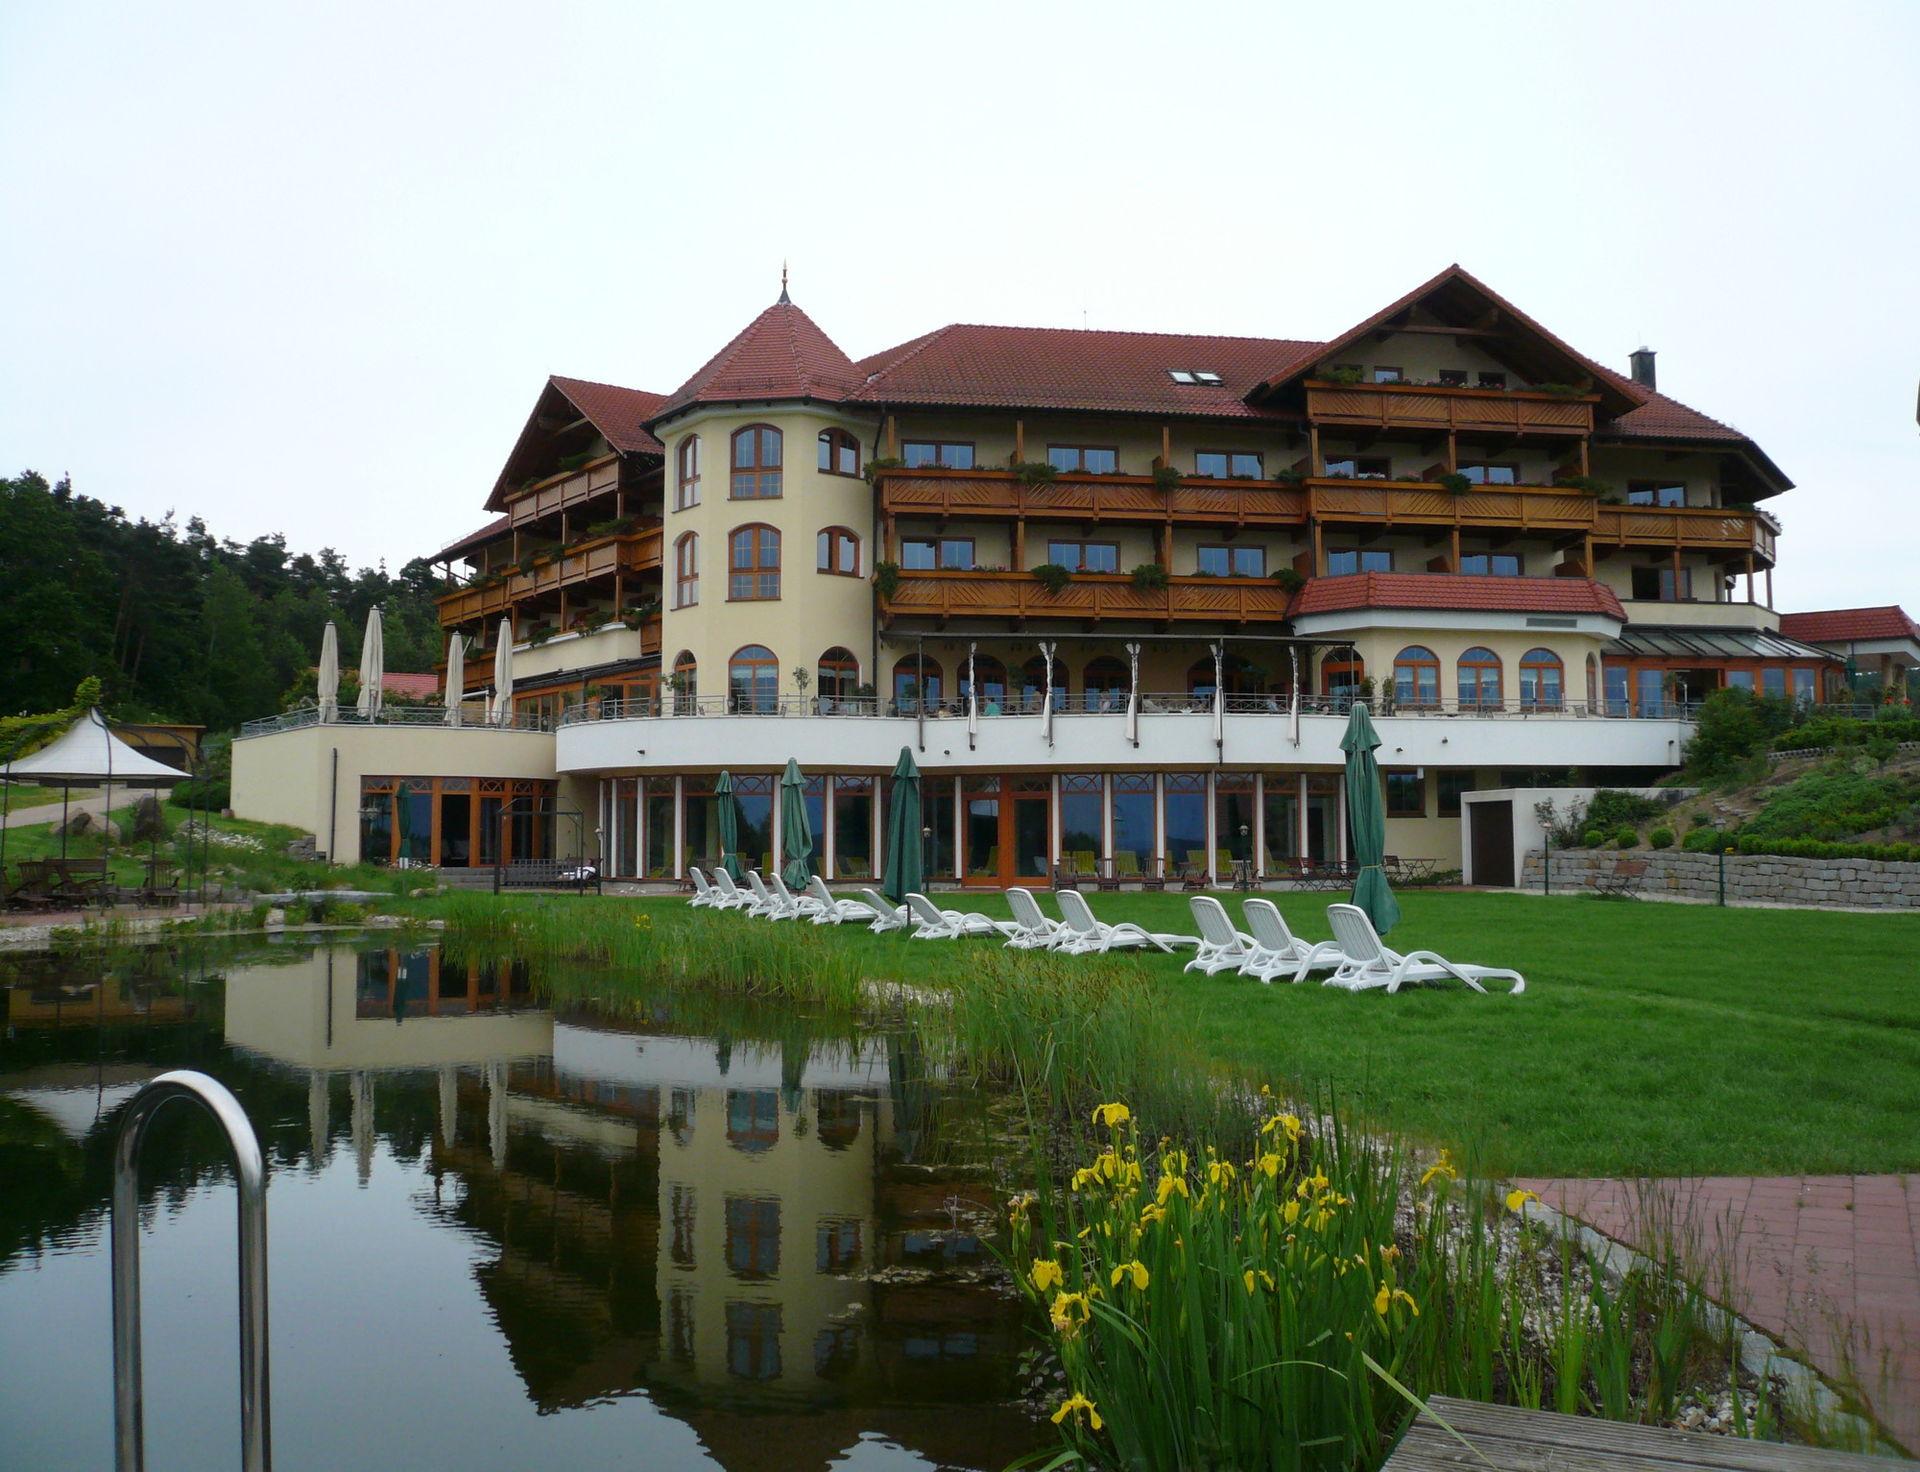 Hotel Restaurant Birkenhof Stolberg Rheinland